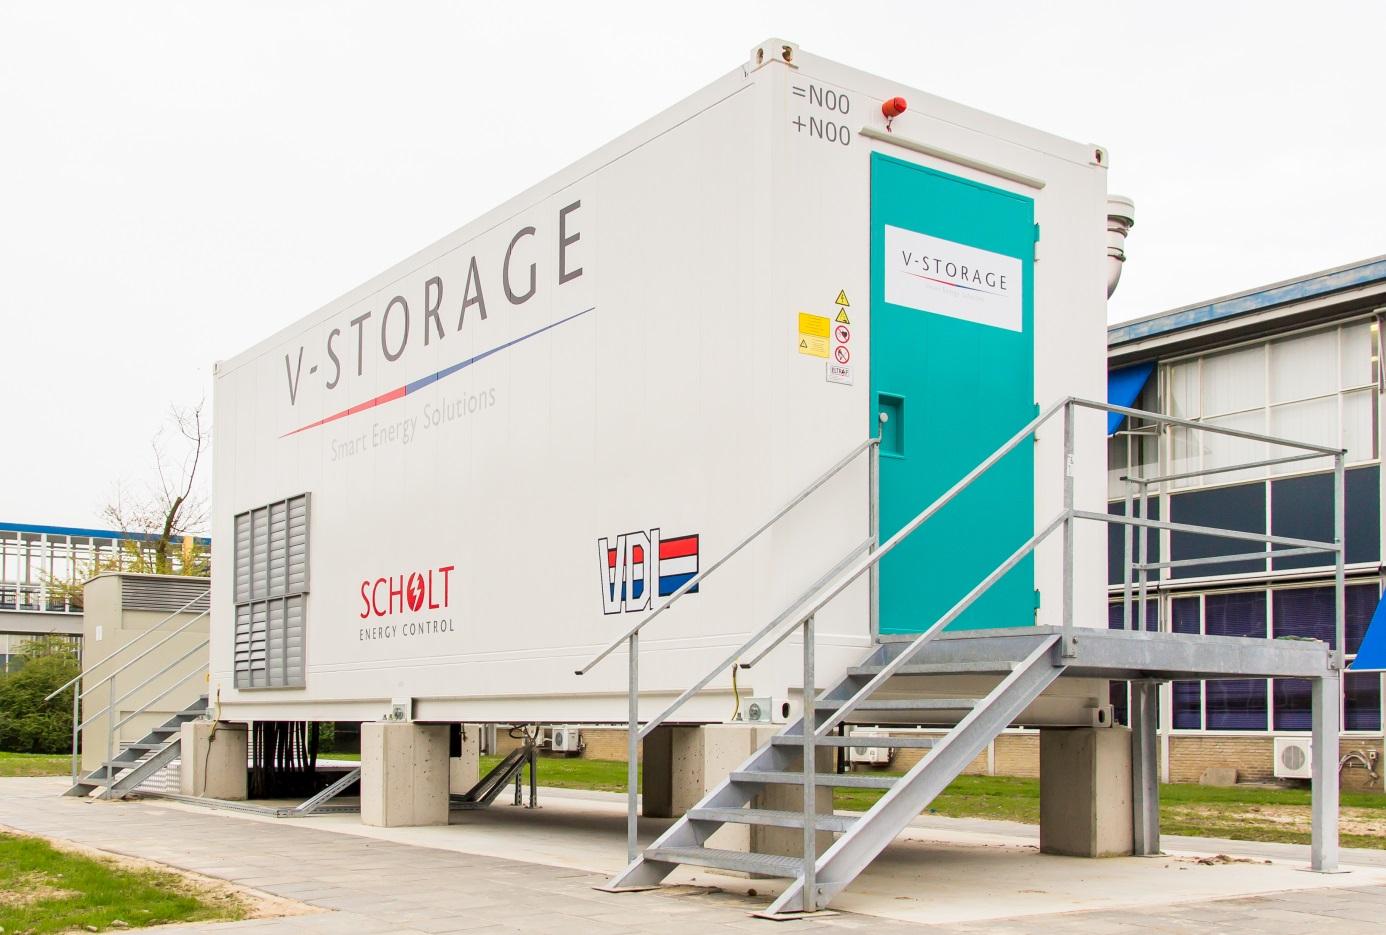 https://pic.vicinity.nl/image/5987/0/4692/dd68e786ec06a3e00ef5f462a7885628/V-storageenergieopslagsysteem.jpg